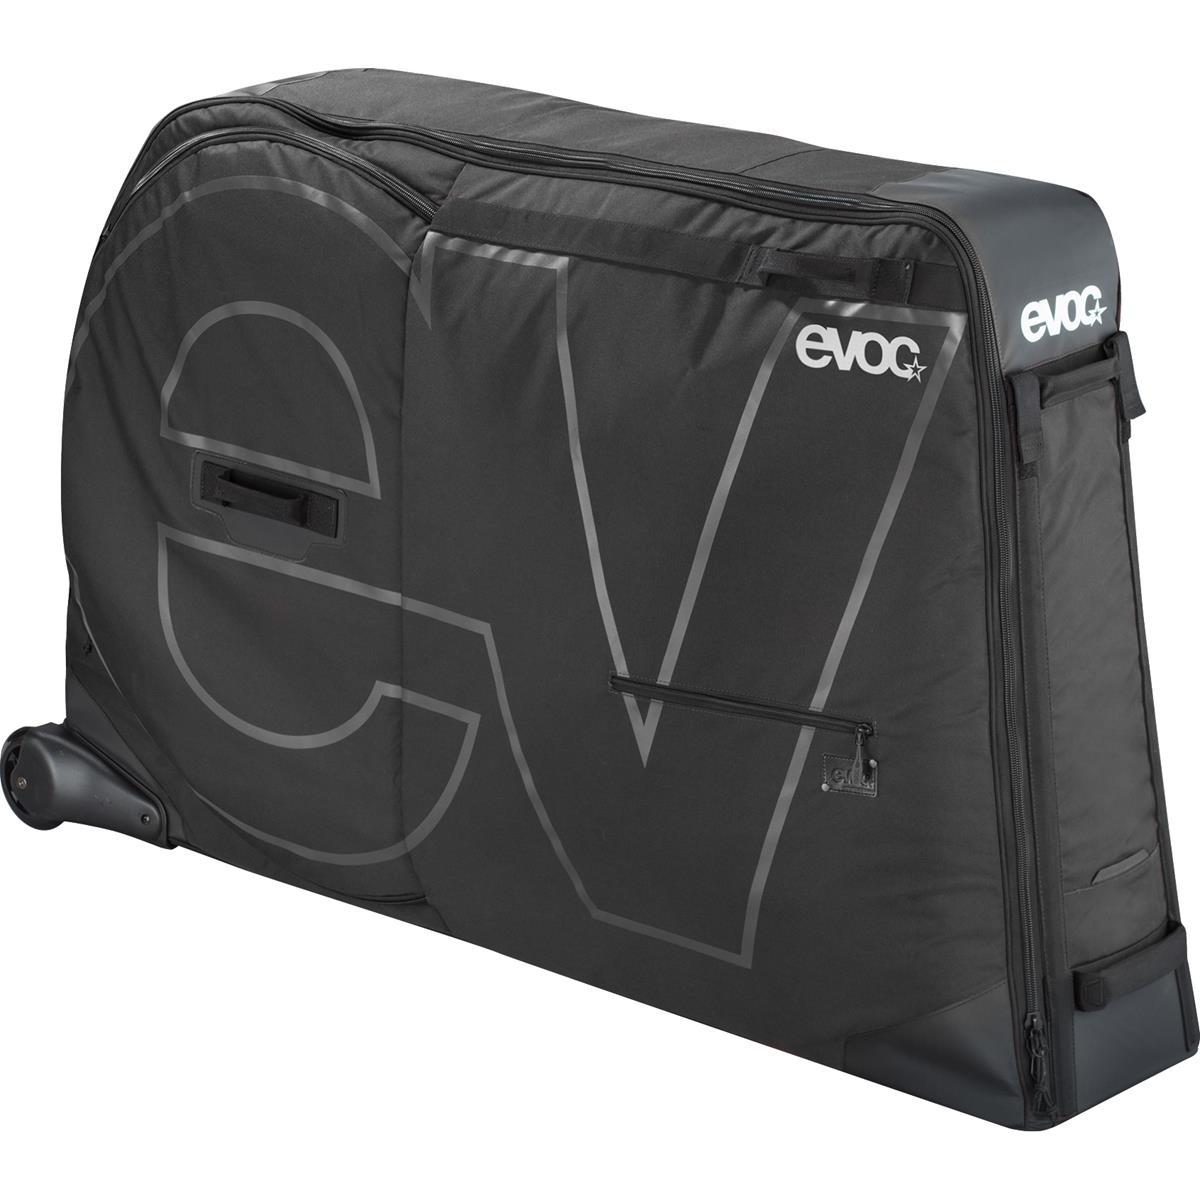 Evoc Fahrrad-Transporttasche Bike Travel Bag Schwarz, 280 Liter